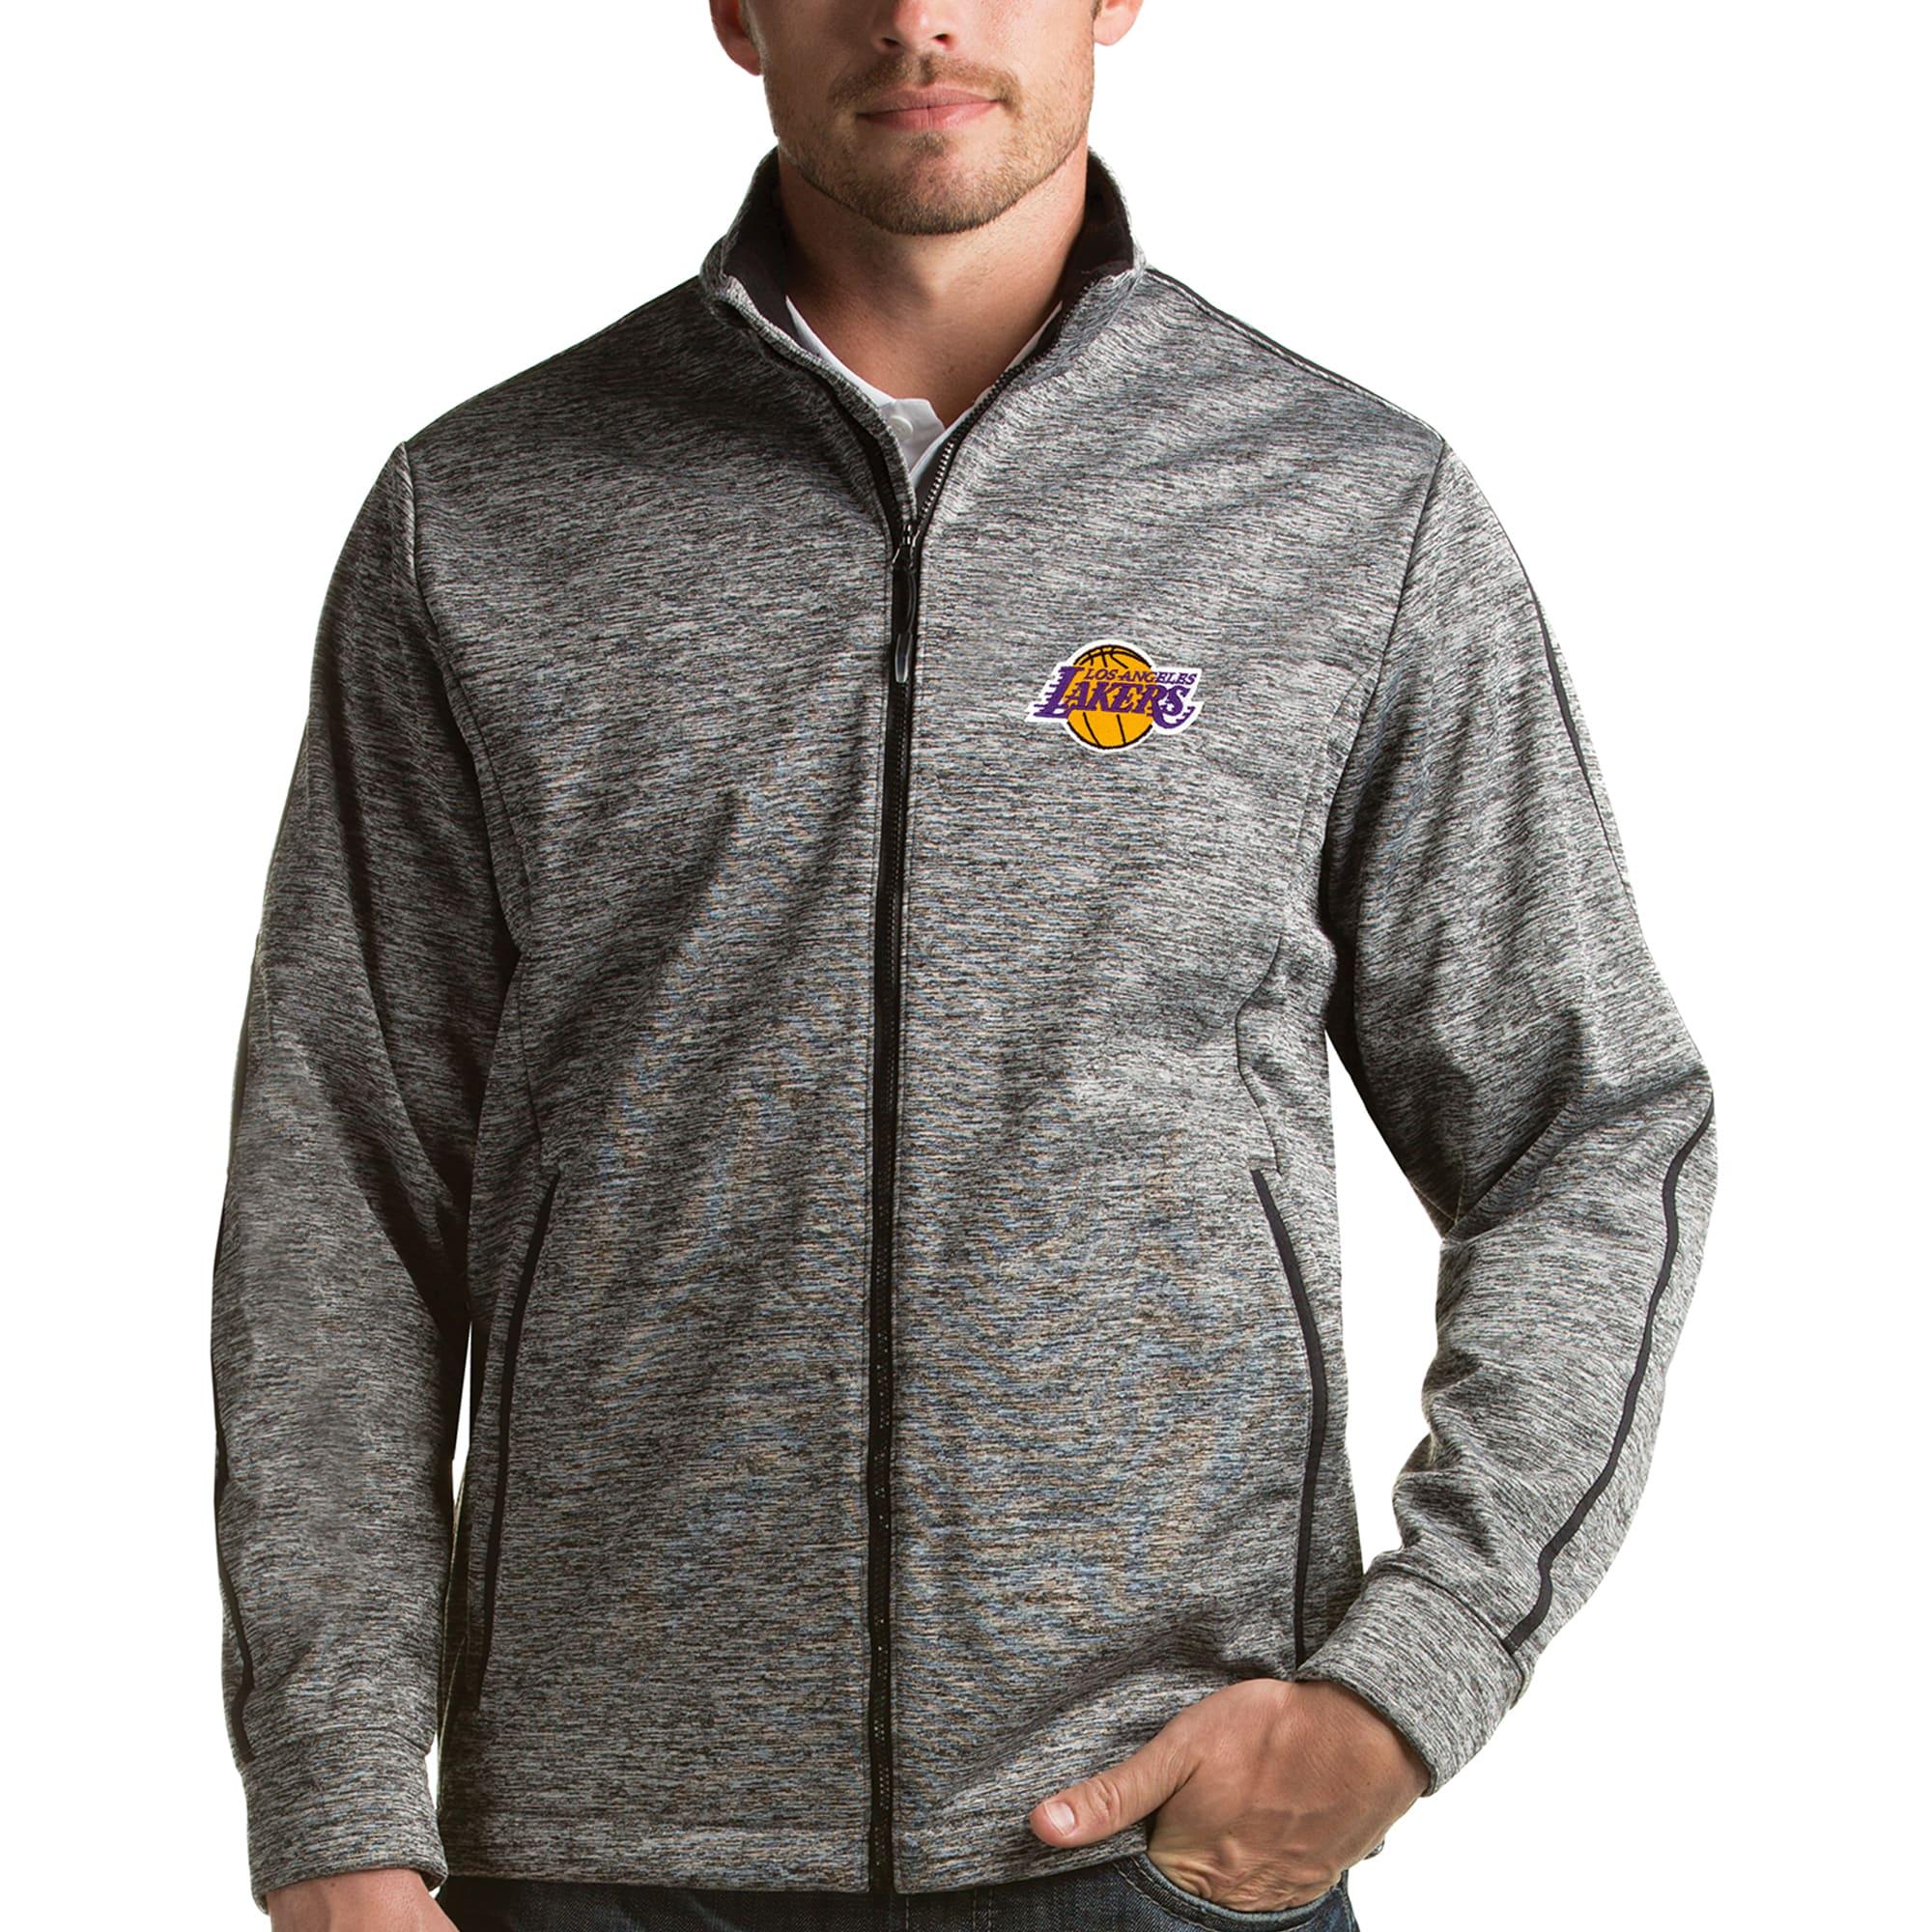 Los Angeles Lakers Antigua Golf Full-Zip Jacket - Heather Gray